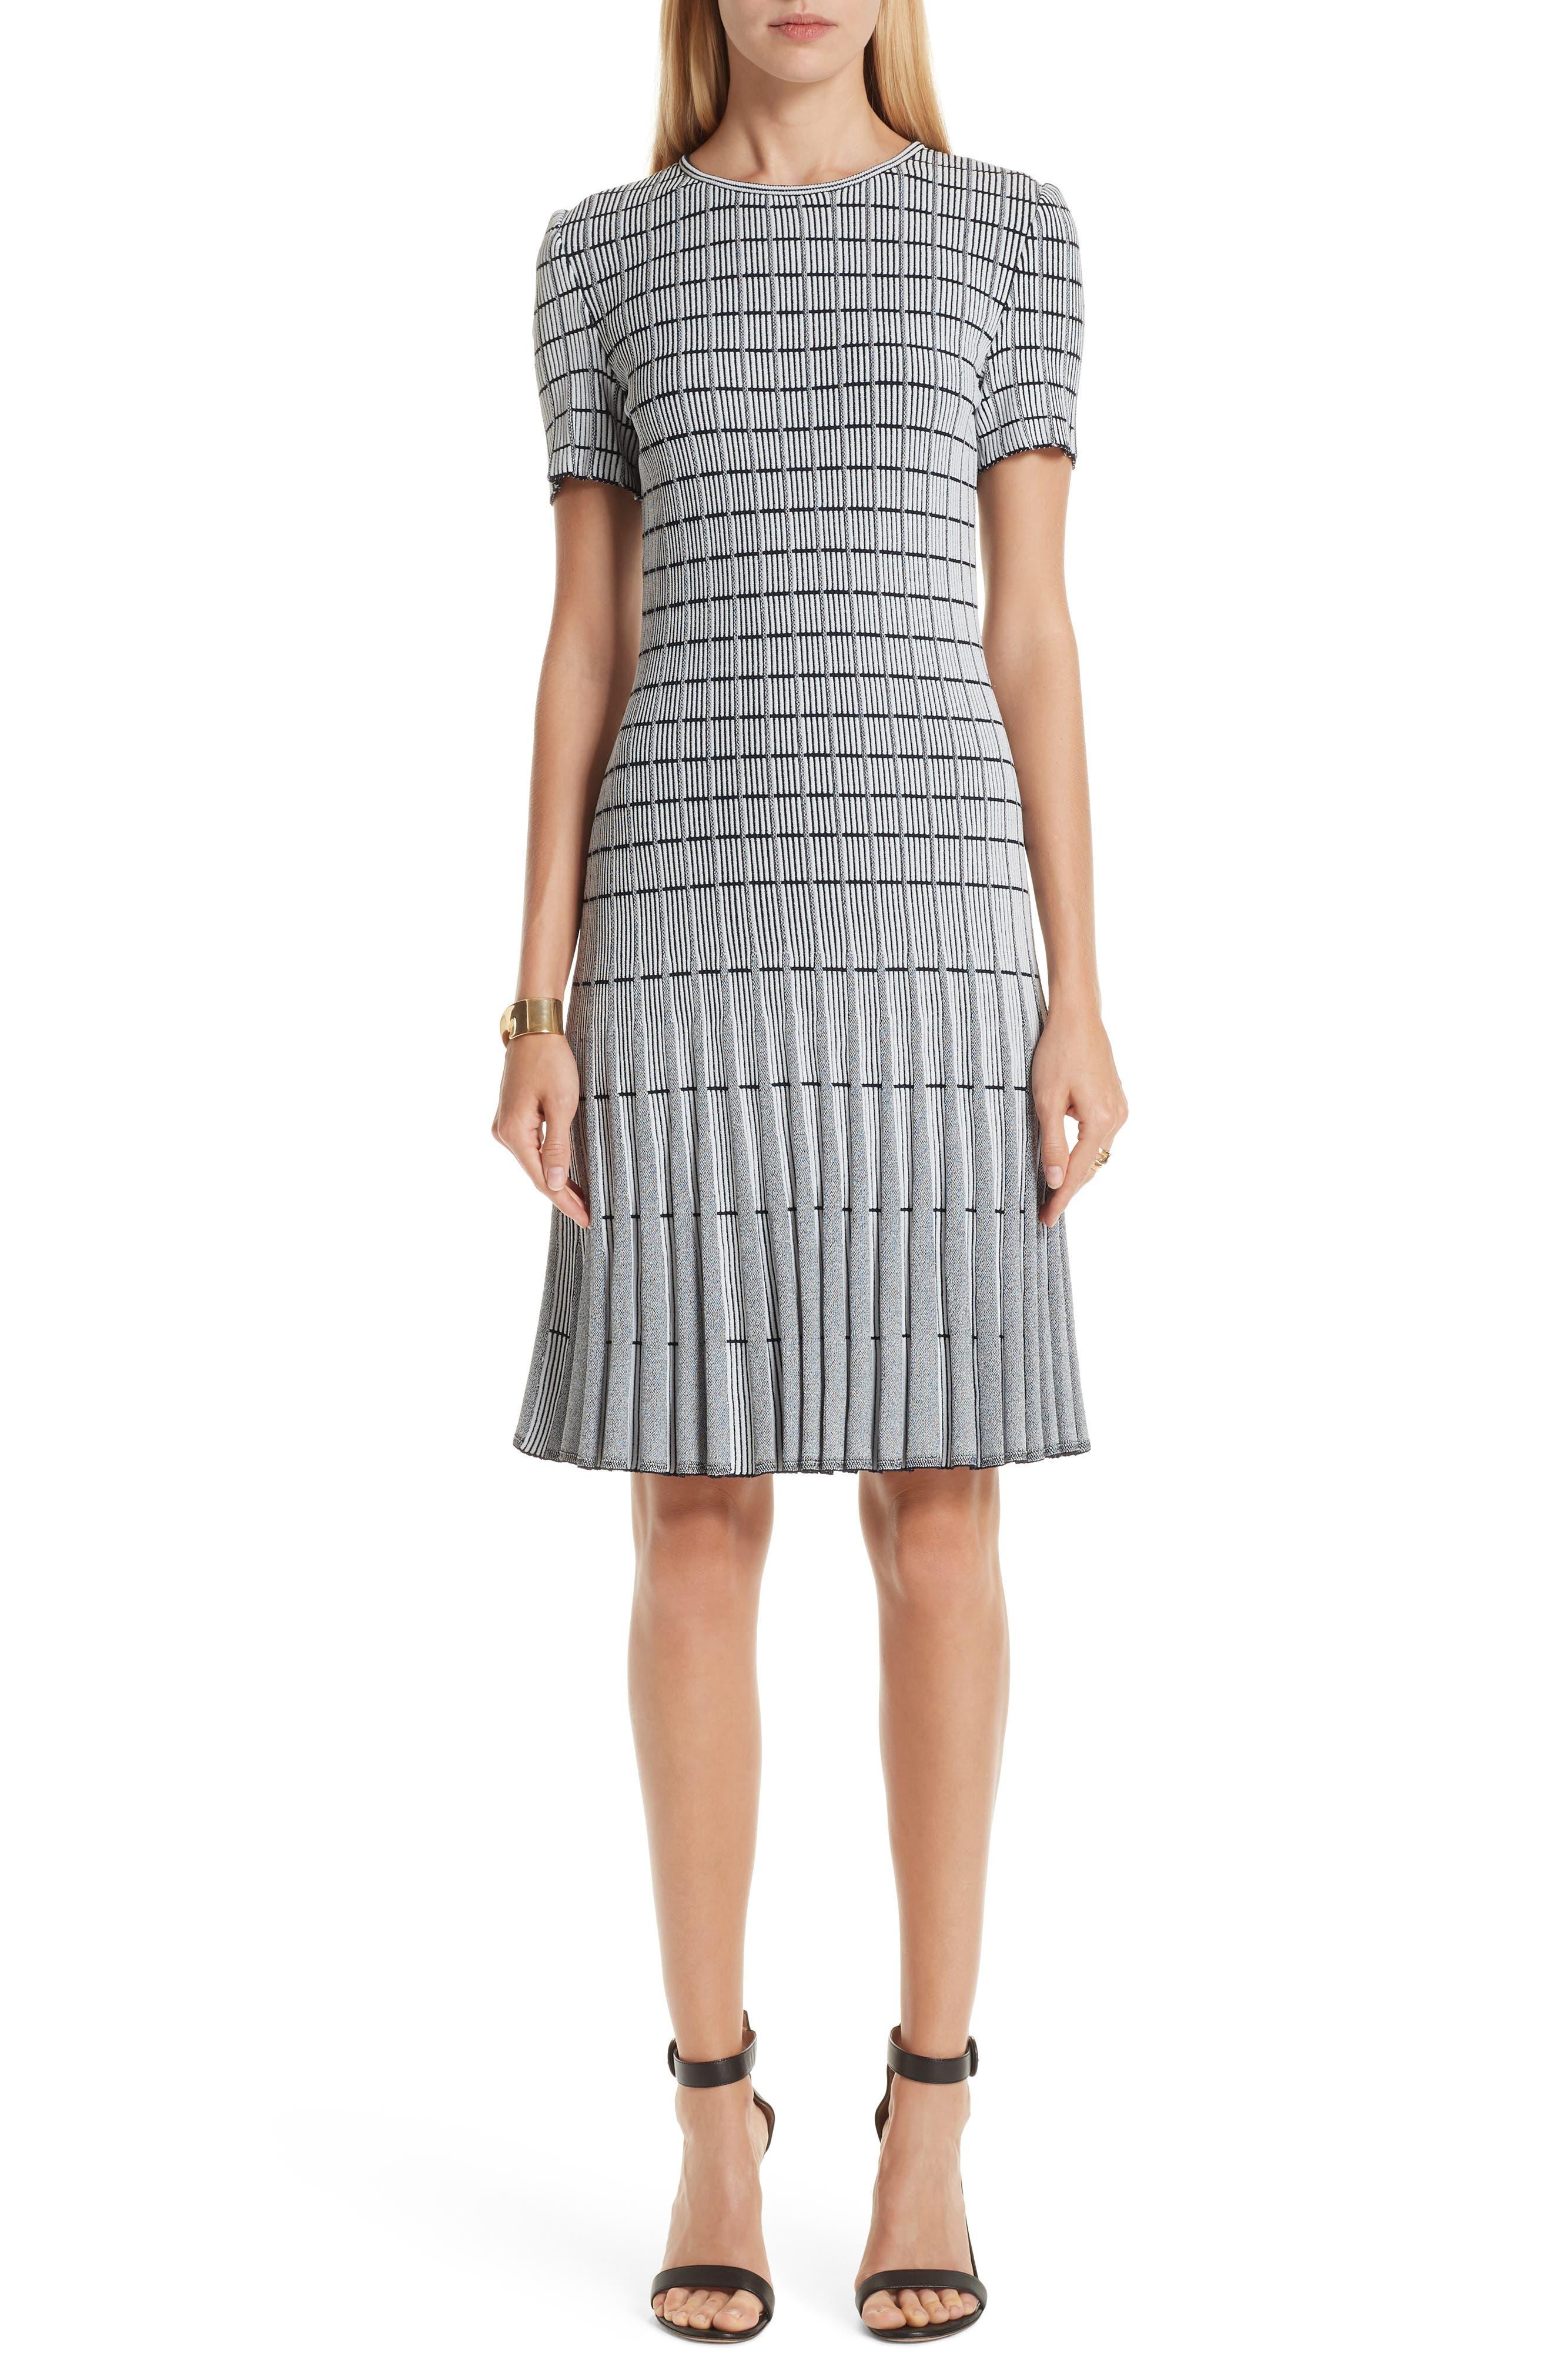 St. John Collection Monochrome Ottoman Knit Dress, Grey